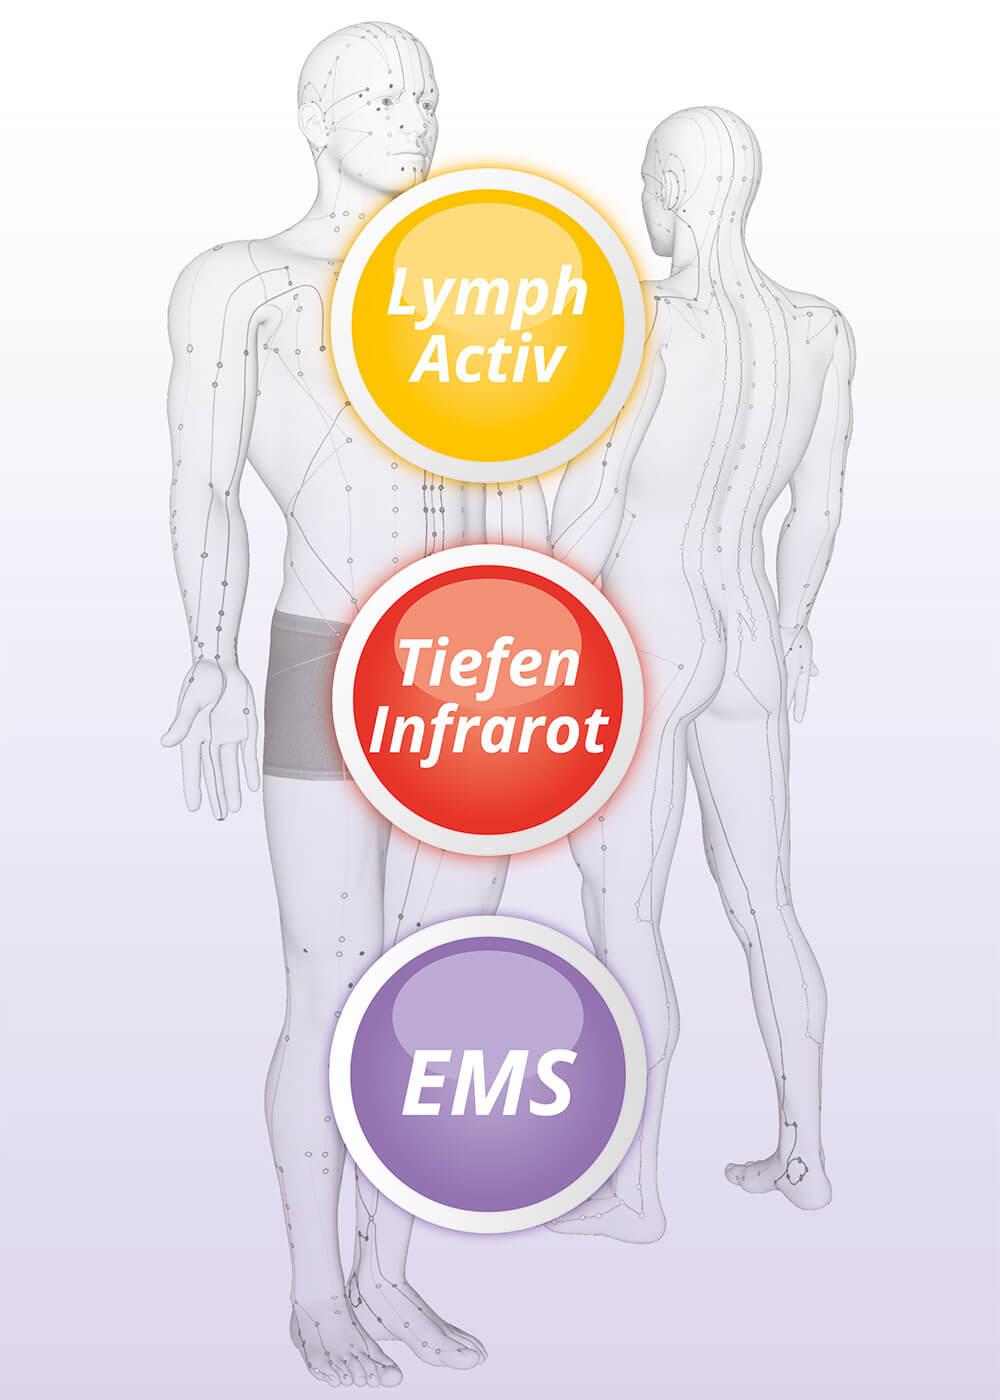 Matrix Body / Lymphdrainage / Tiefen Infrarot / EMS